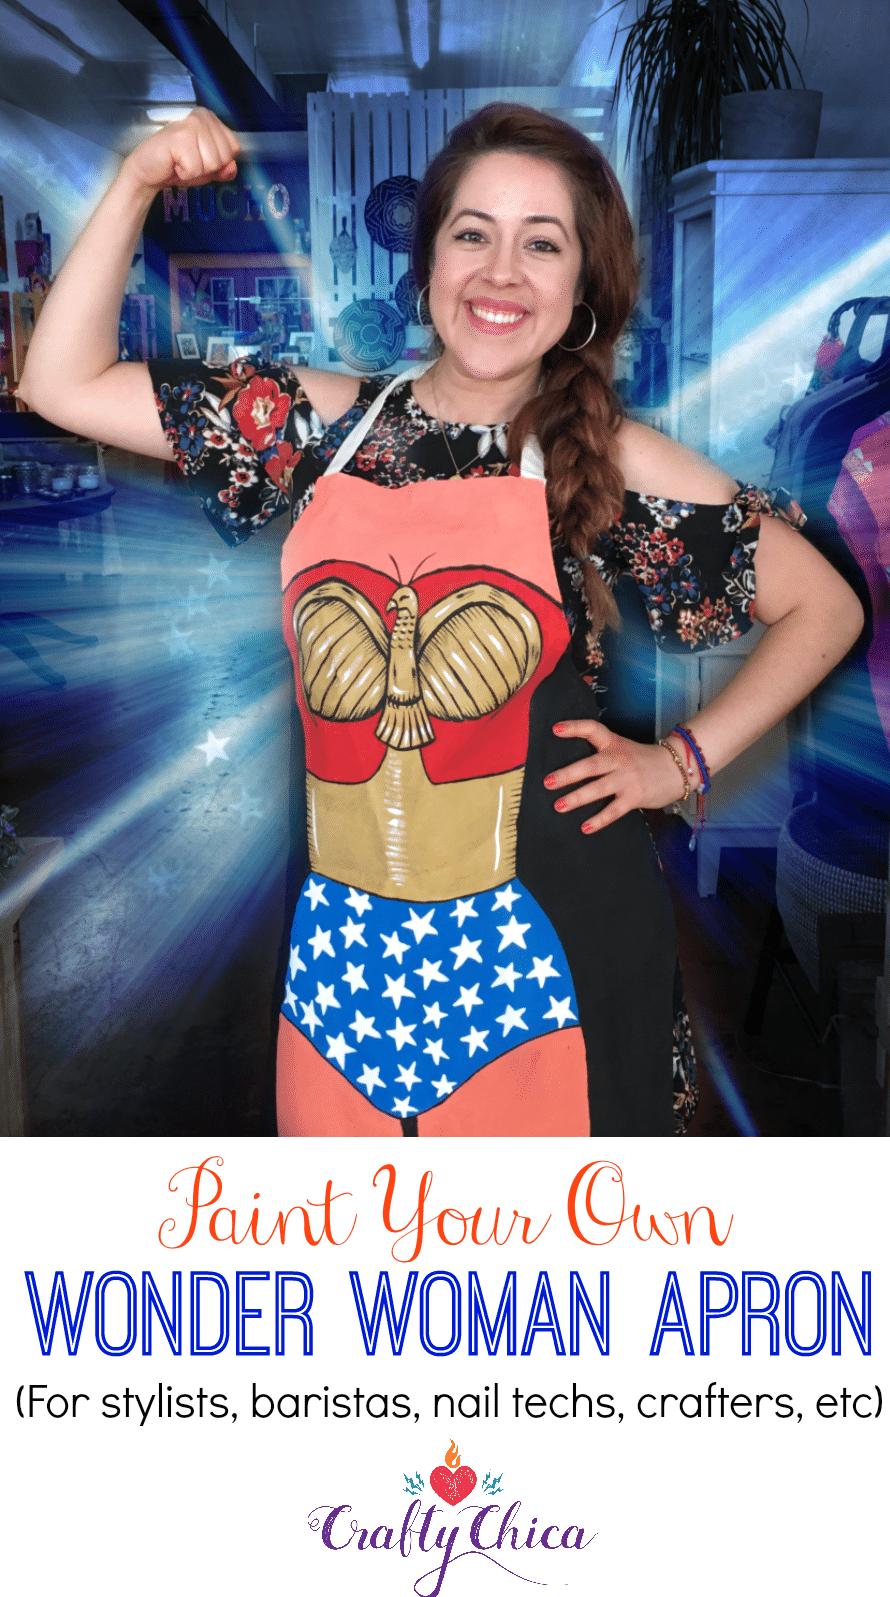 Wonder Woman apron idea!